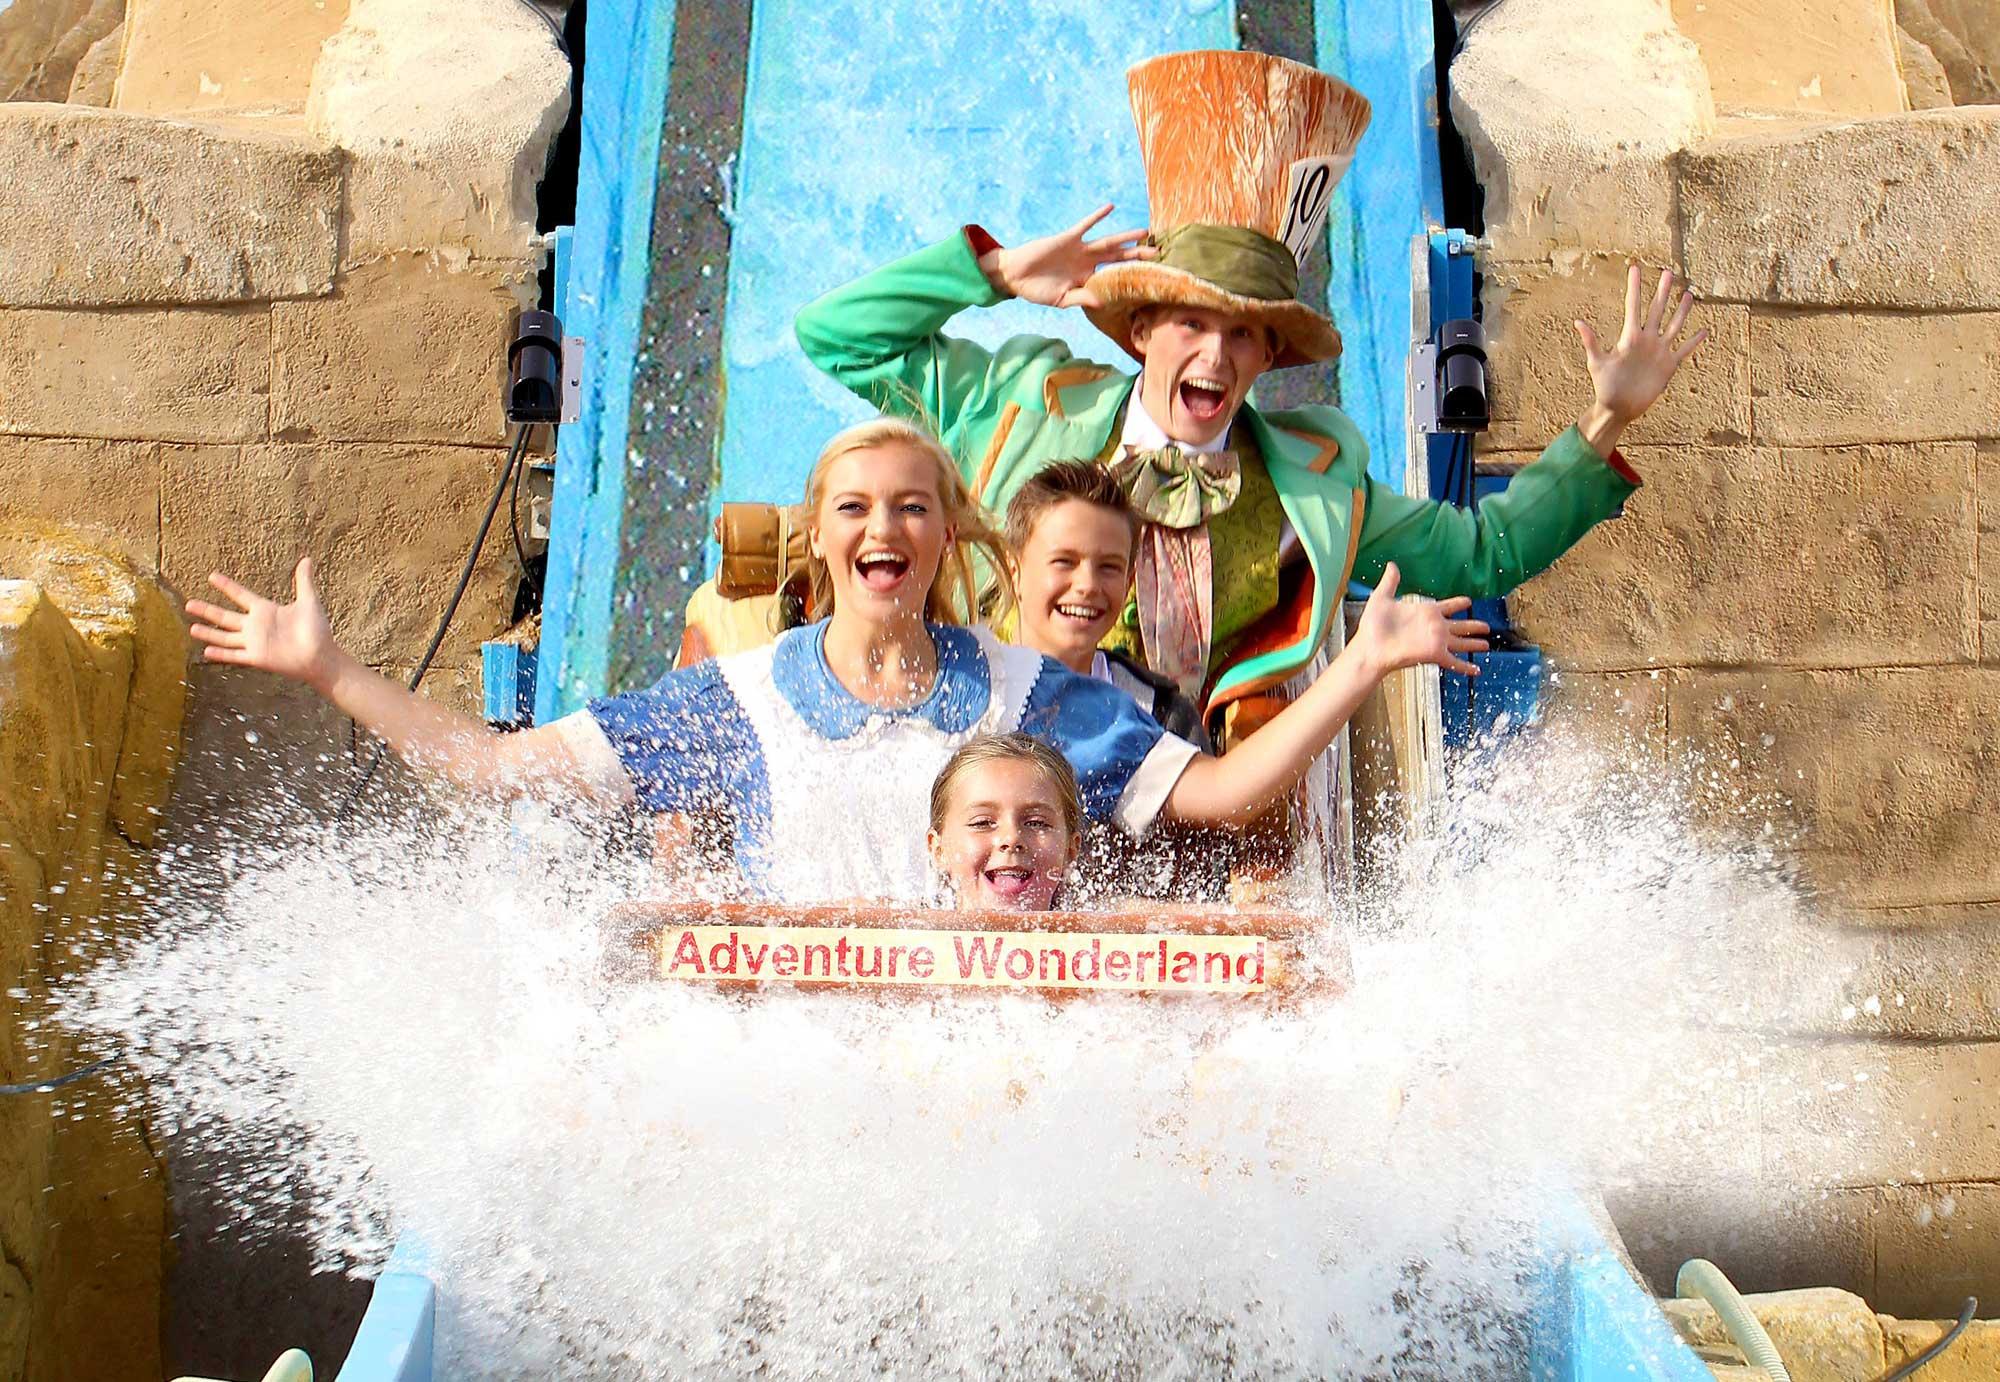 Adventure Wonderland - Fun For The Family In Dorset